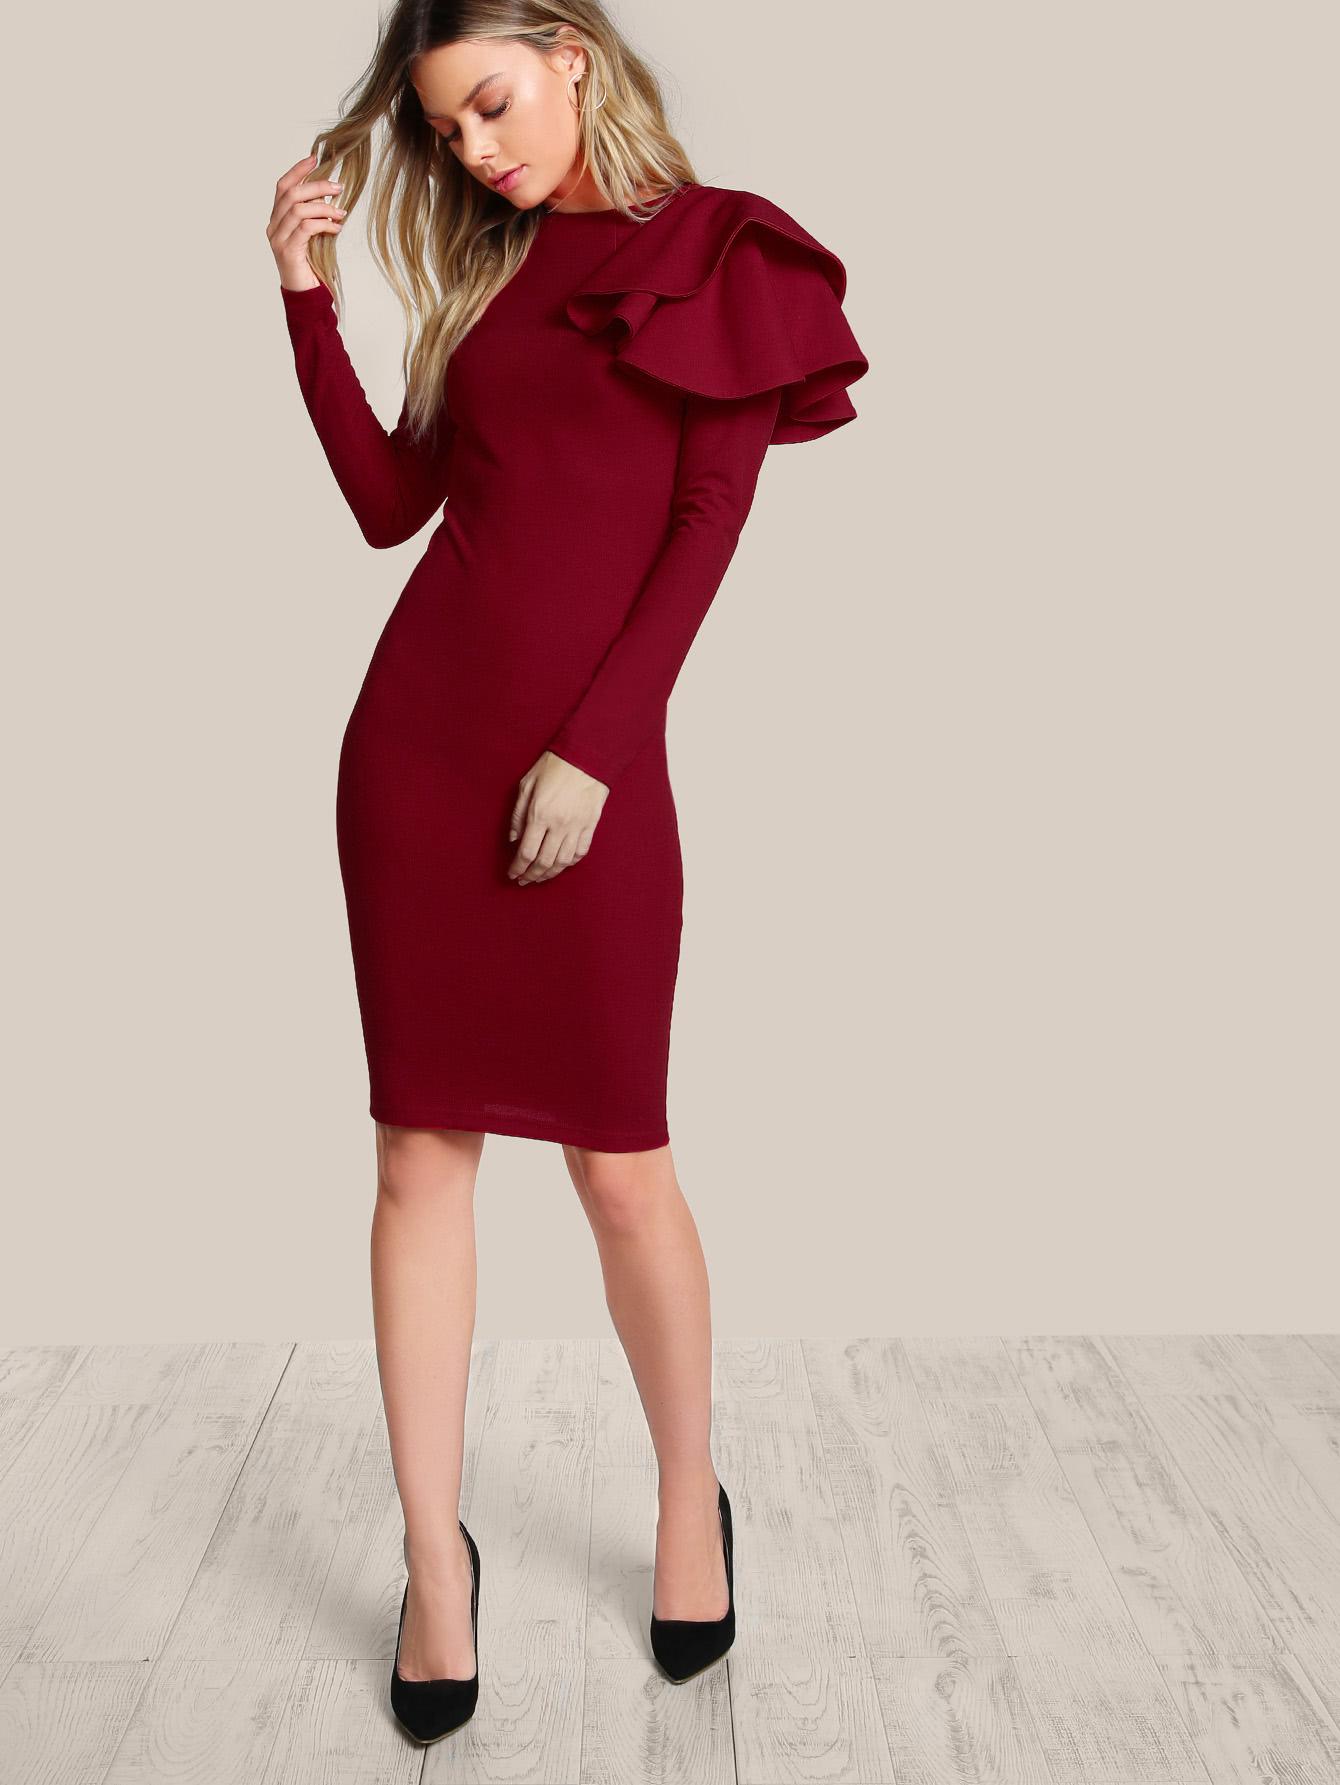 One Side Tiered Ruffle Trim Dress tiered layer ruffle jacket